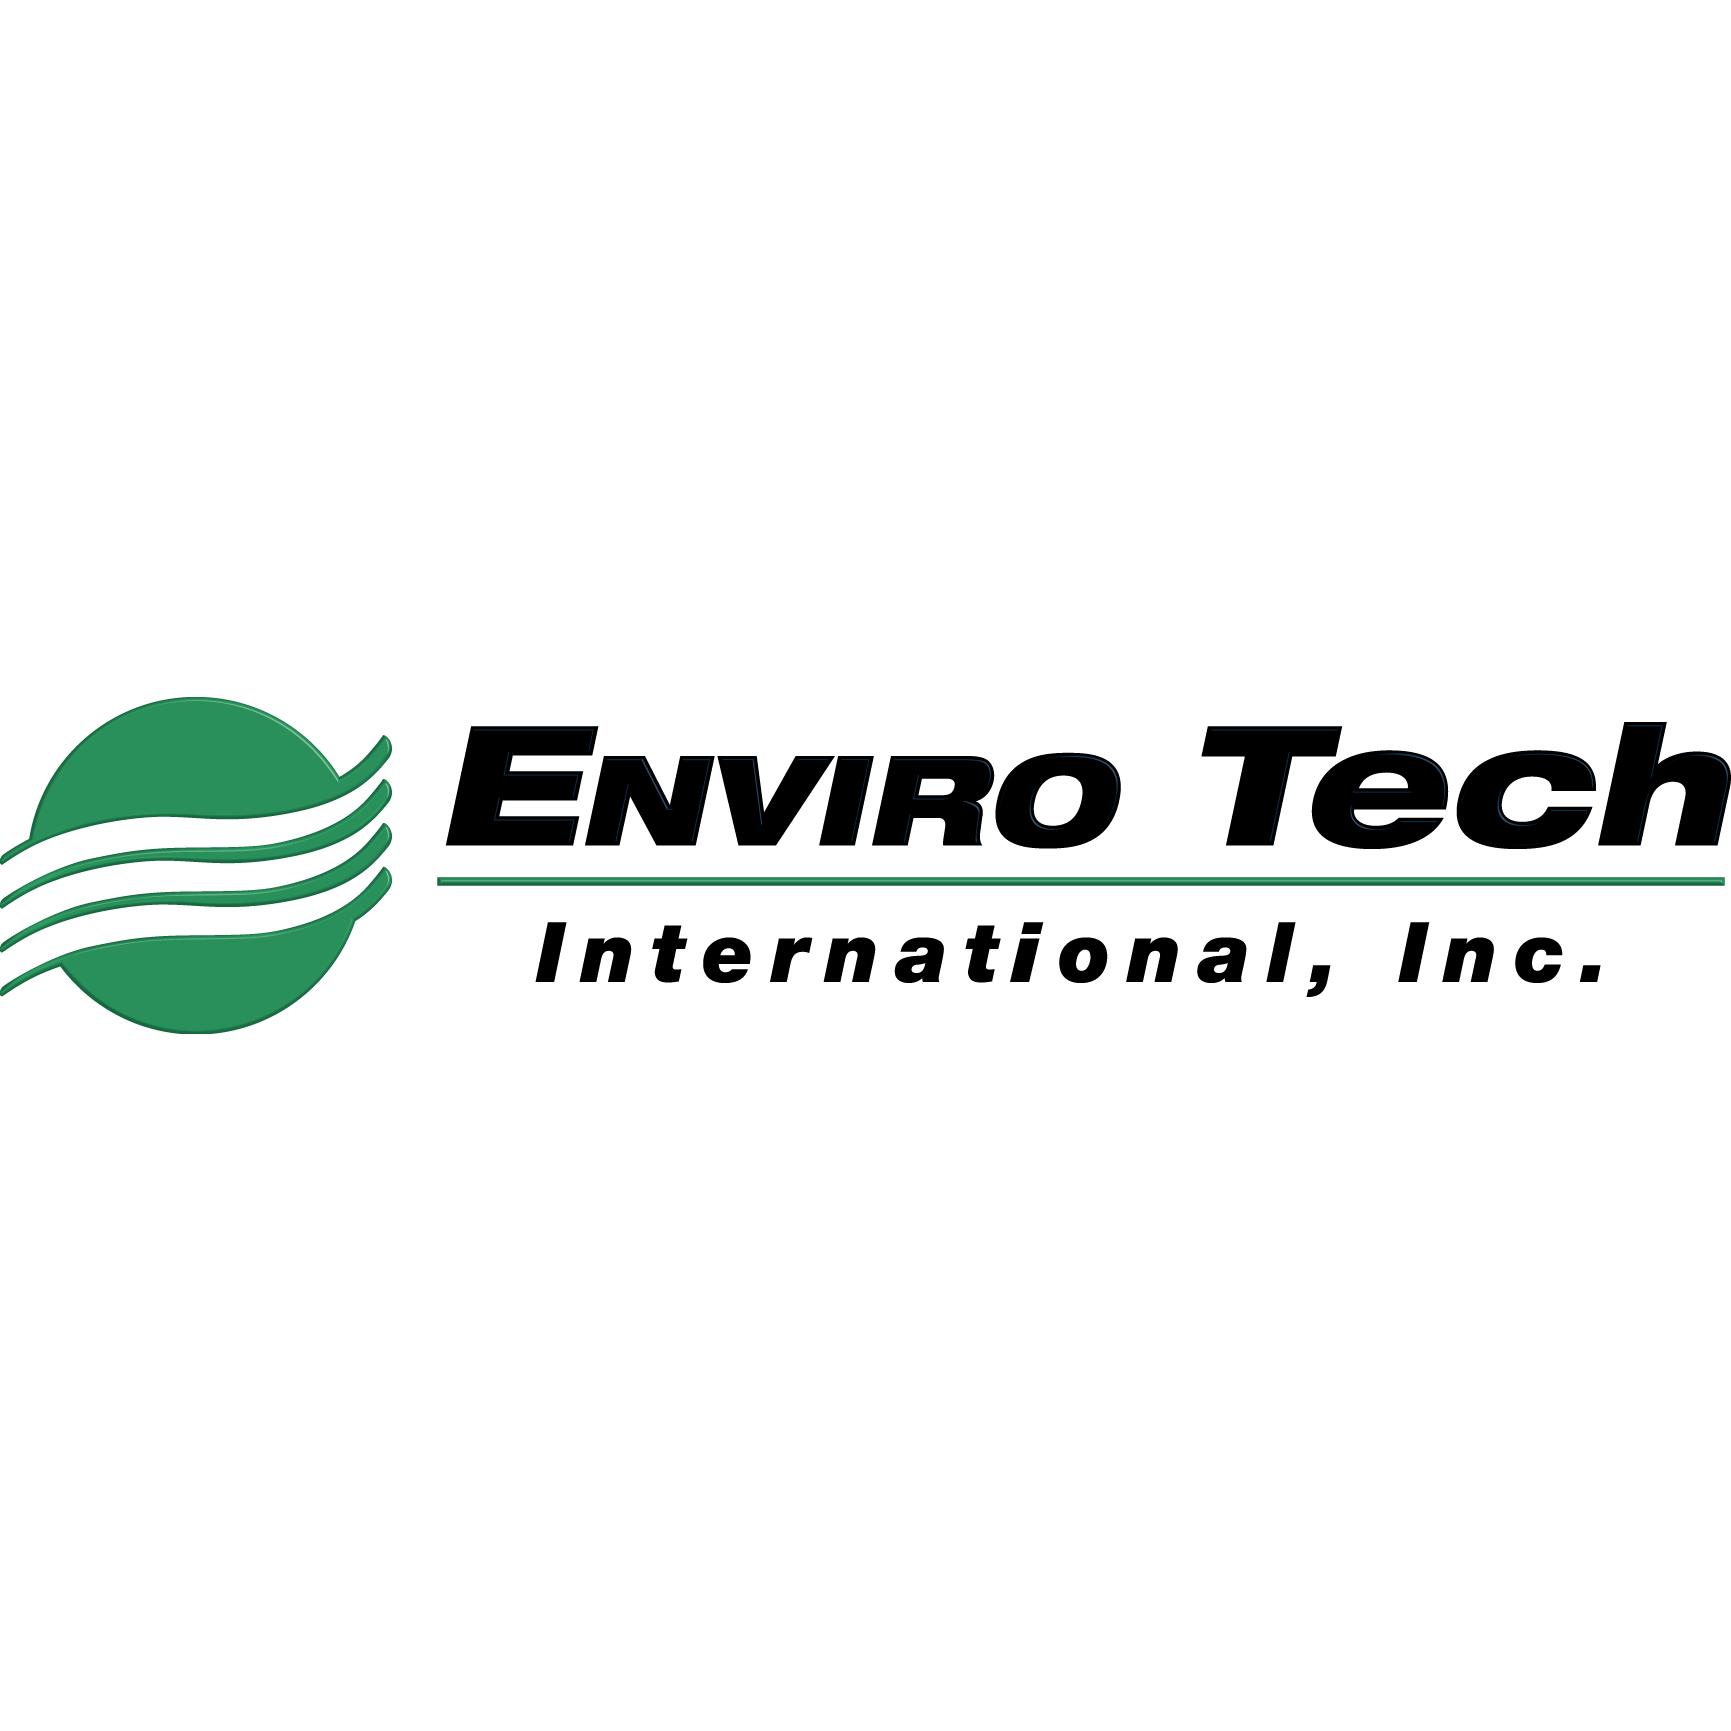 Enviro Tech International, Inc.